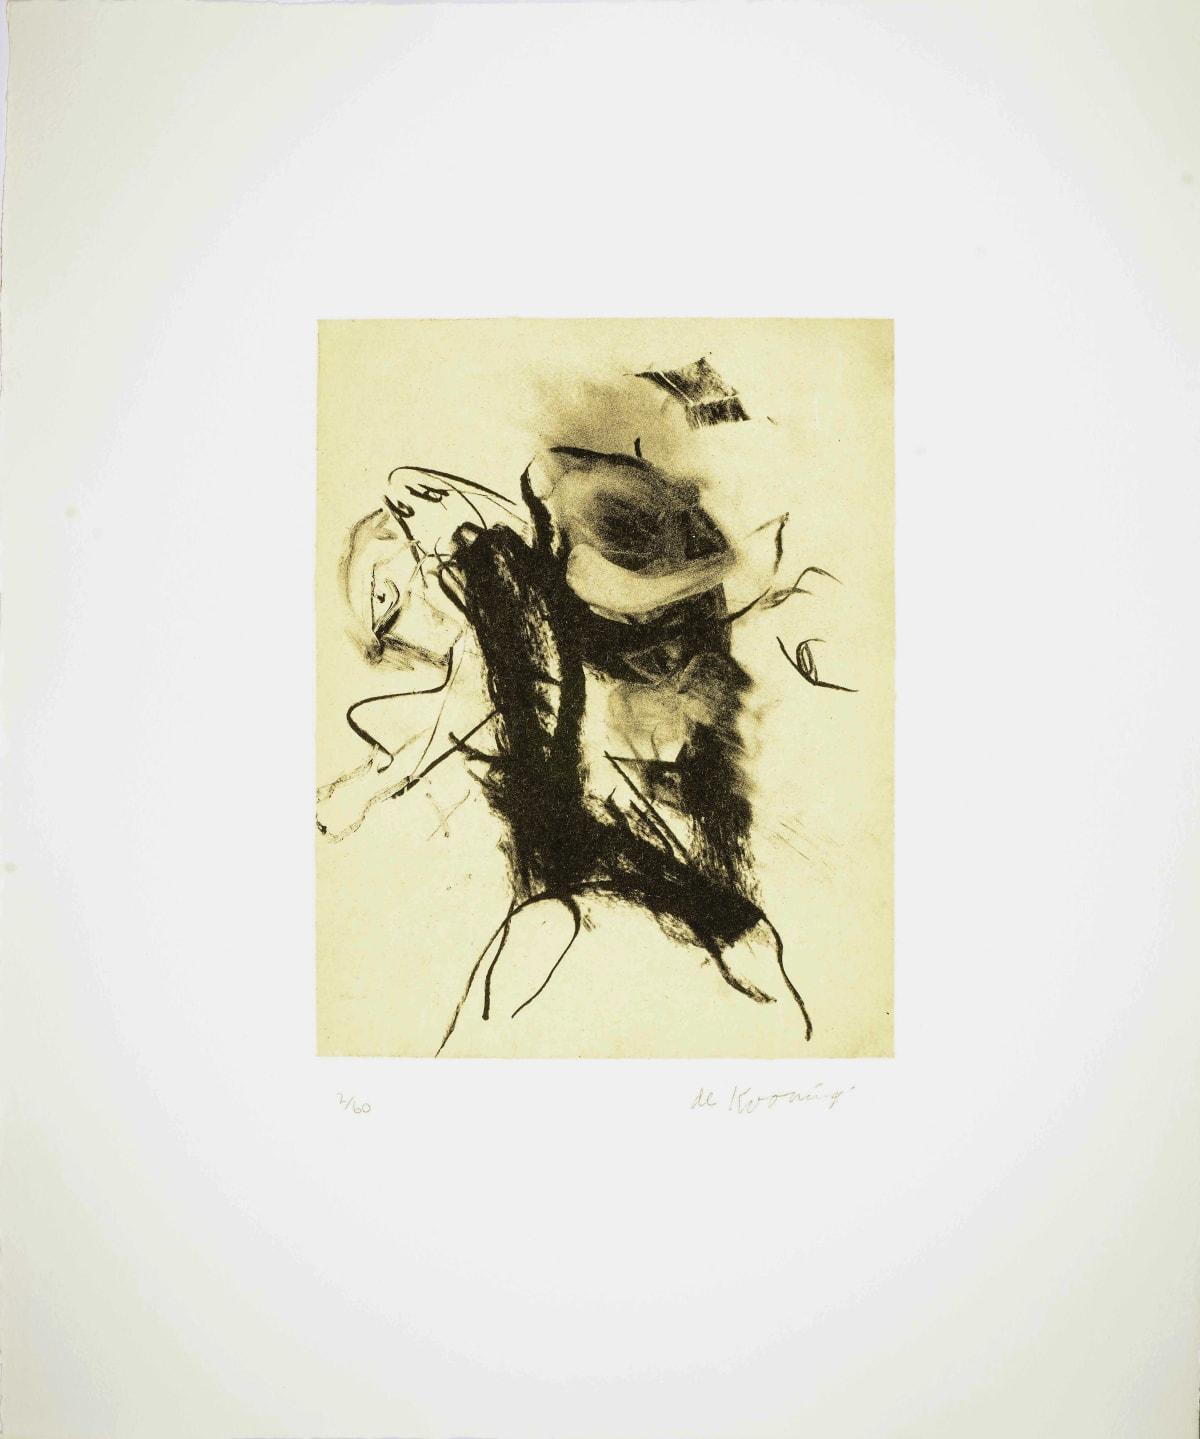 Willem de Kooning, Seventeen Lithographs for Frank O'Hara: Plate XIV, 1988